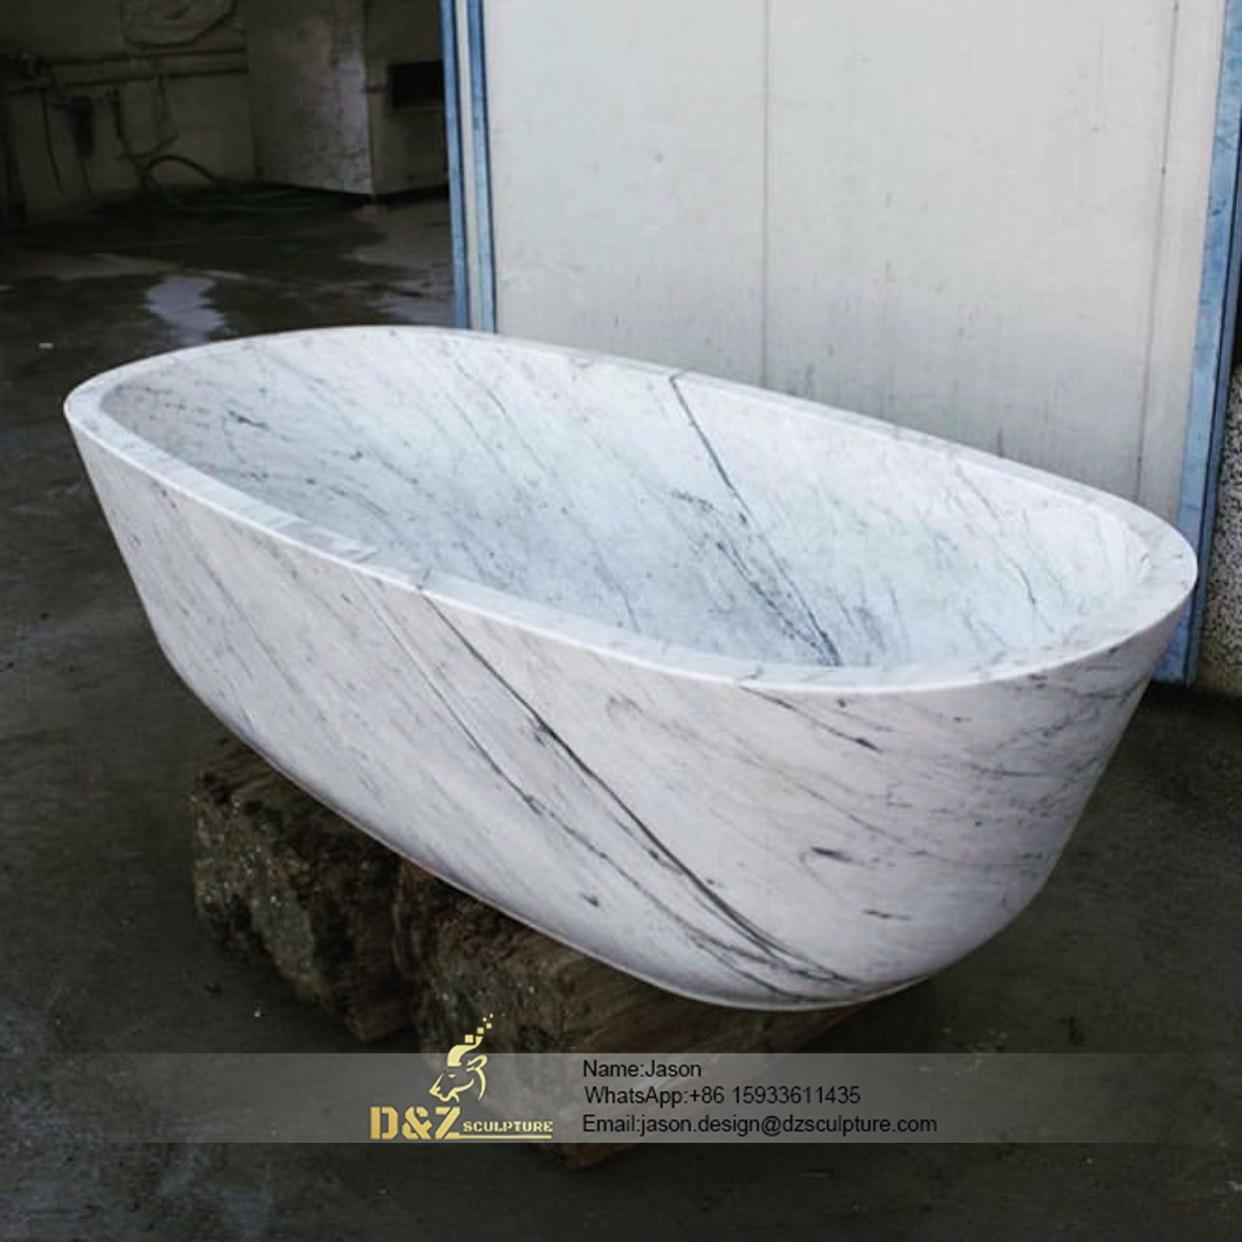 The natural stone bathtub